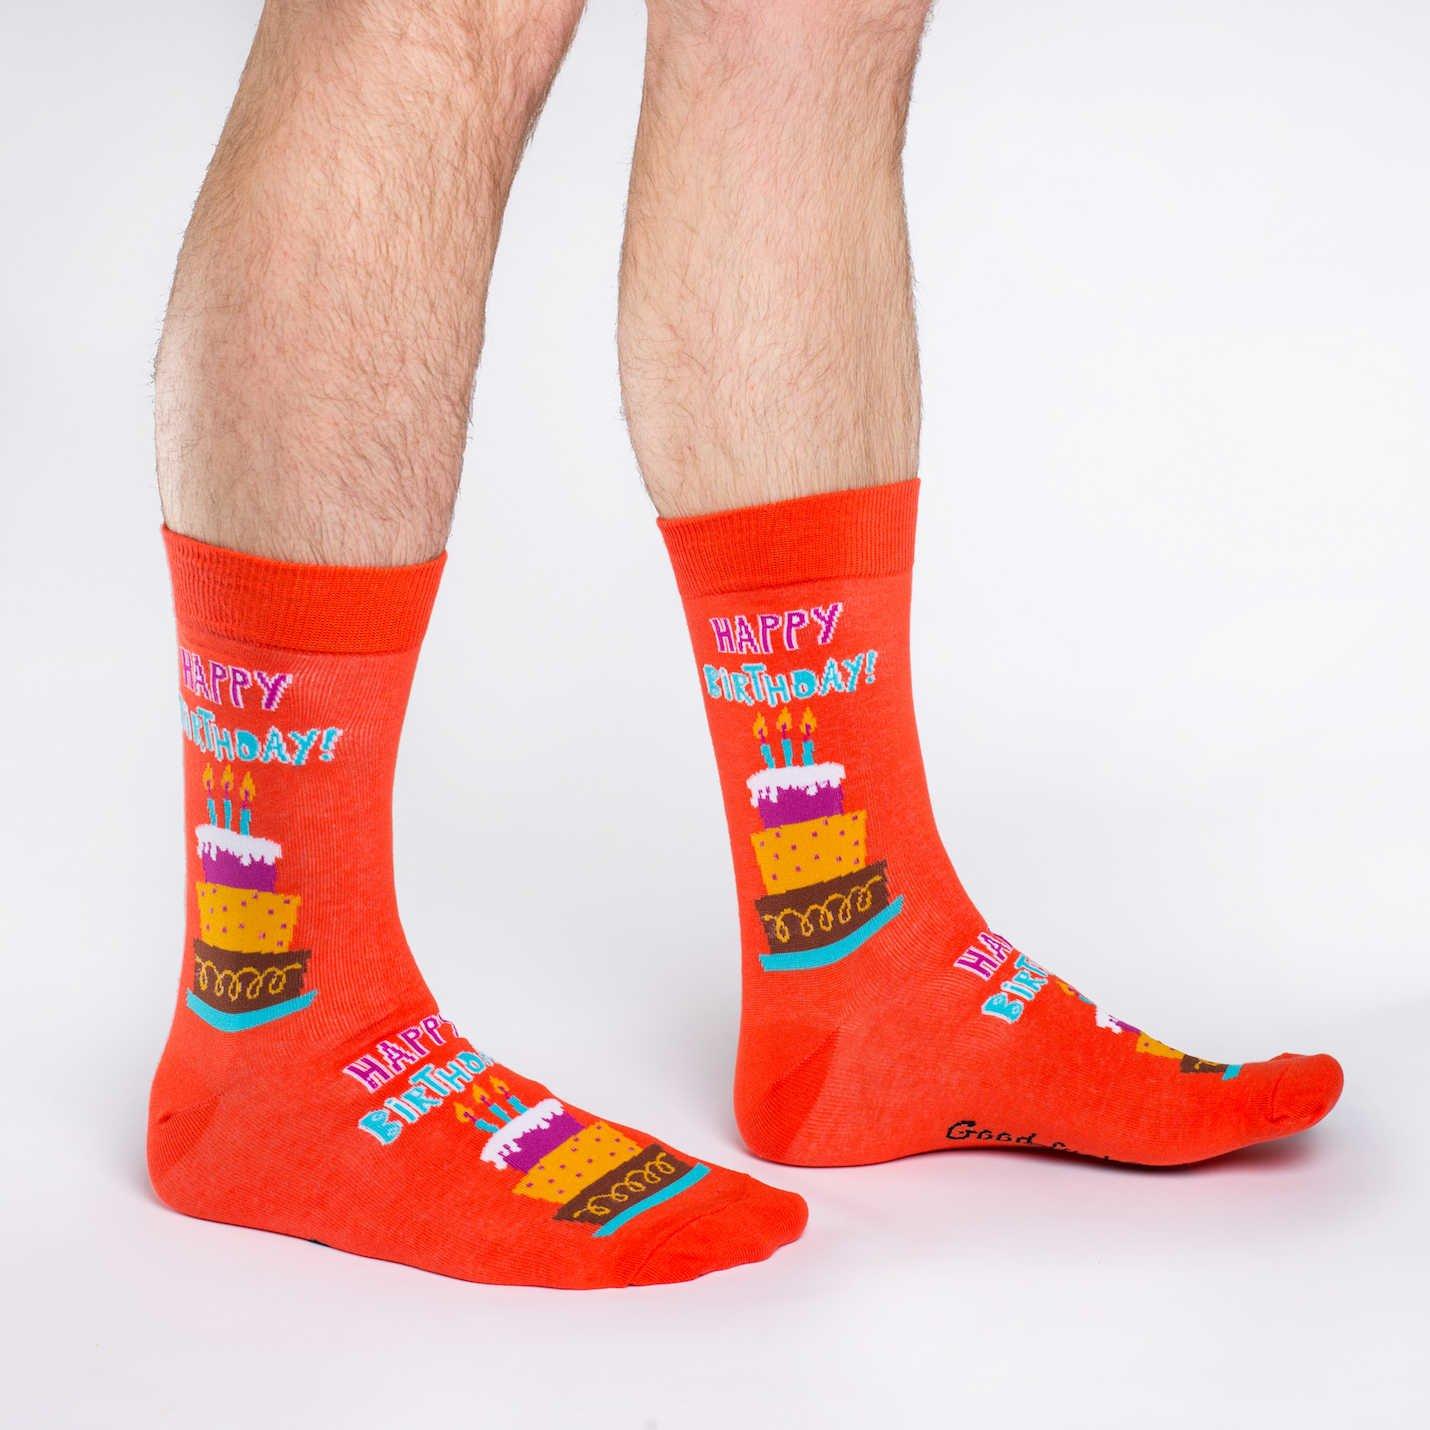 Good Luck Sock Mens Happy Birthday Crew Socks Orange Adult Shoe size 7-12